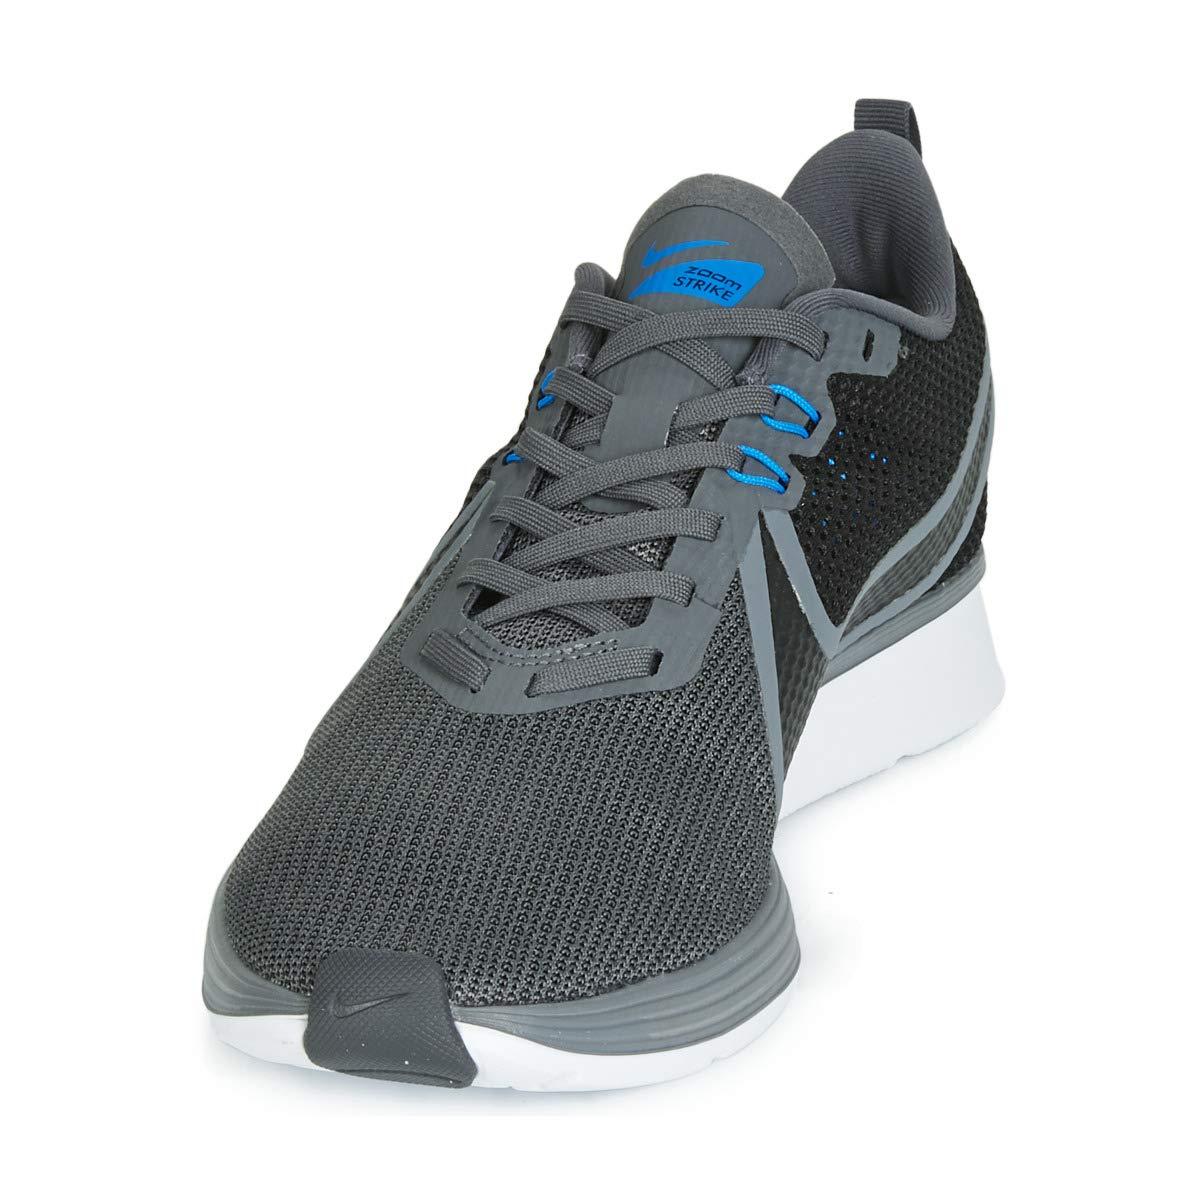 00b5ac0220d Nike Zoom Strike 2